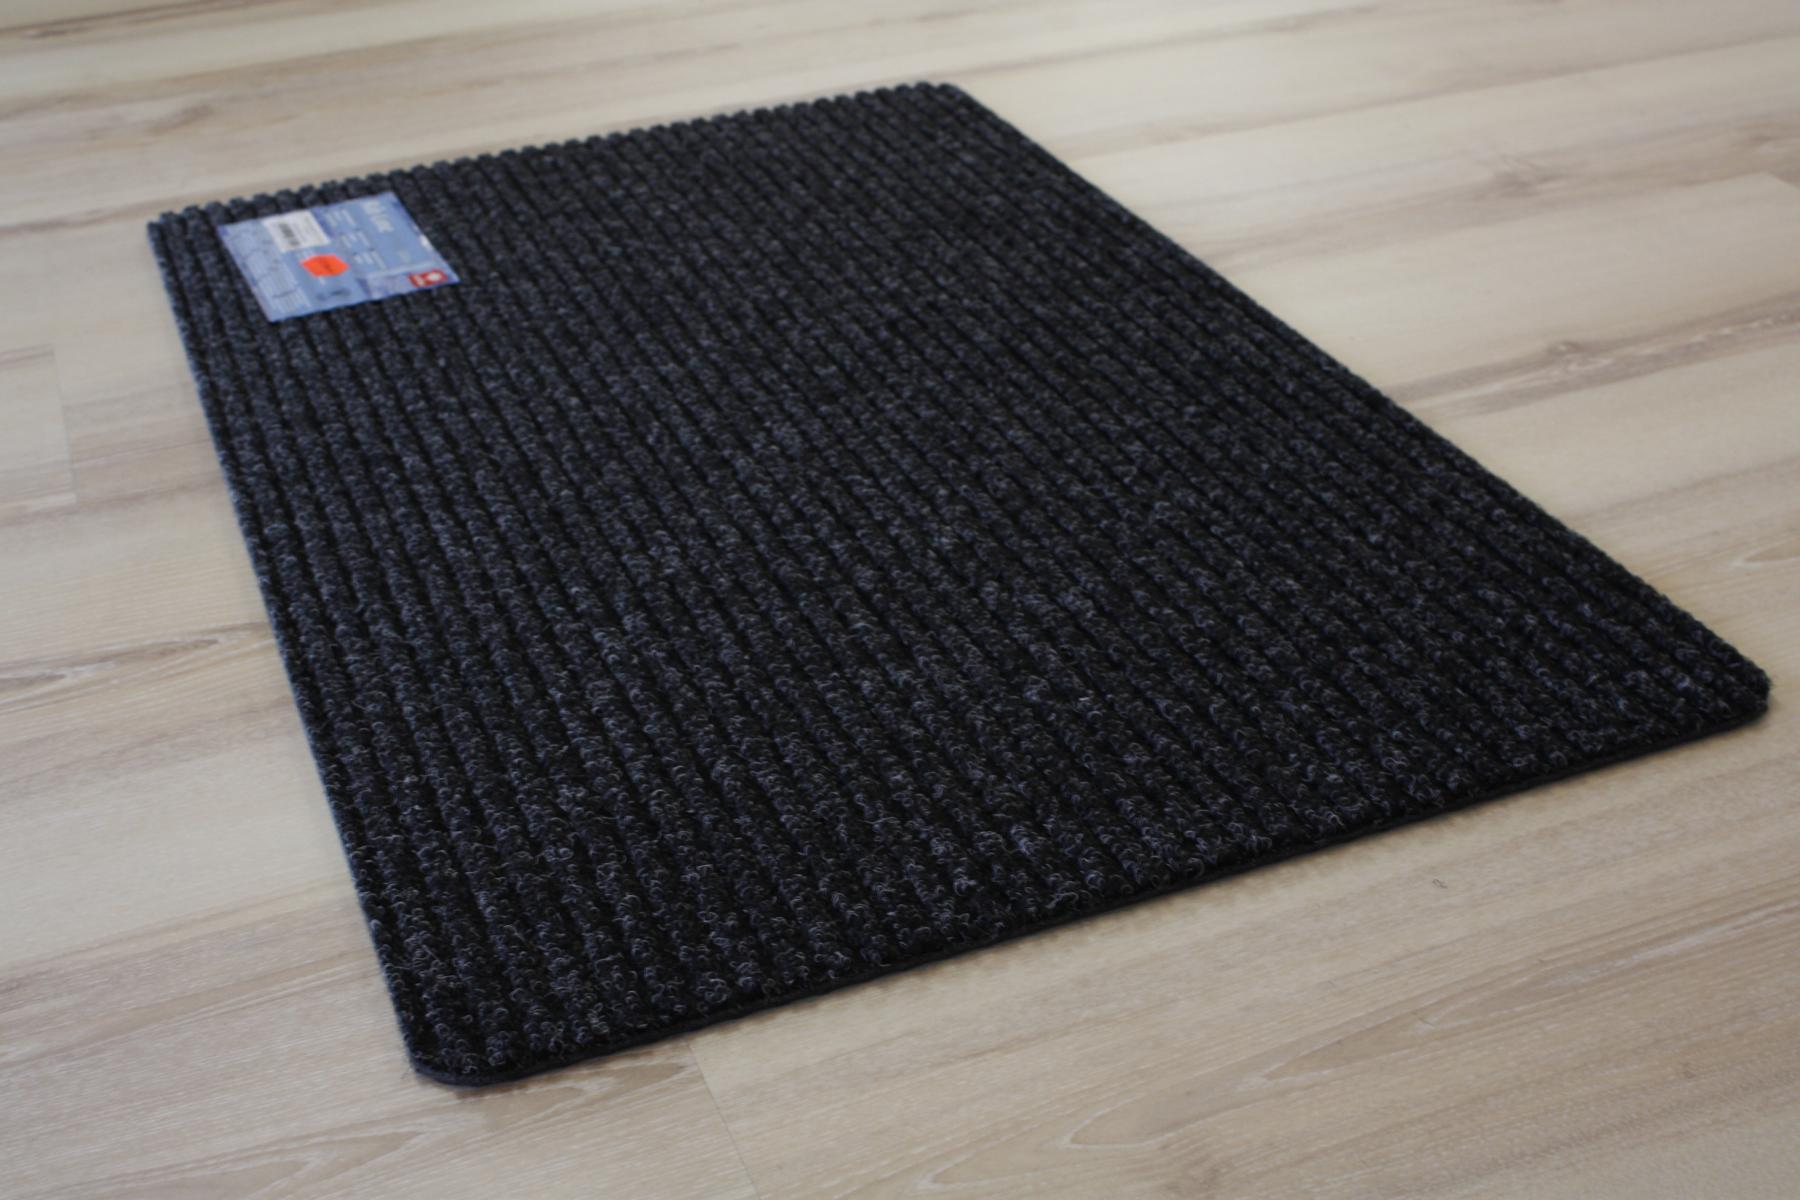 Foot Mat Door Mat Rib Line 48 black grey 50×80 cm  eBay